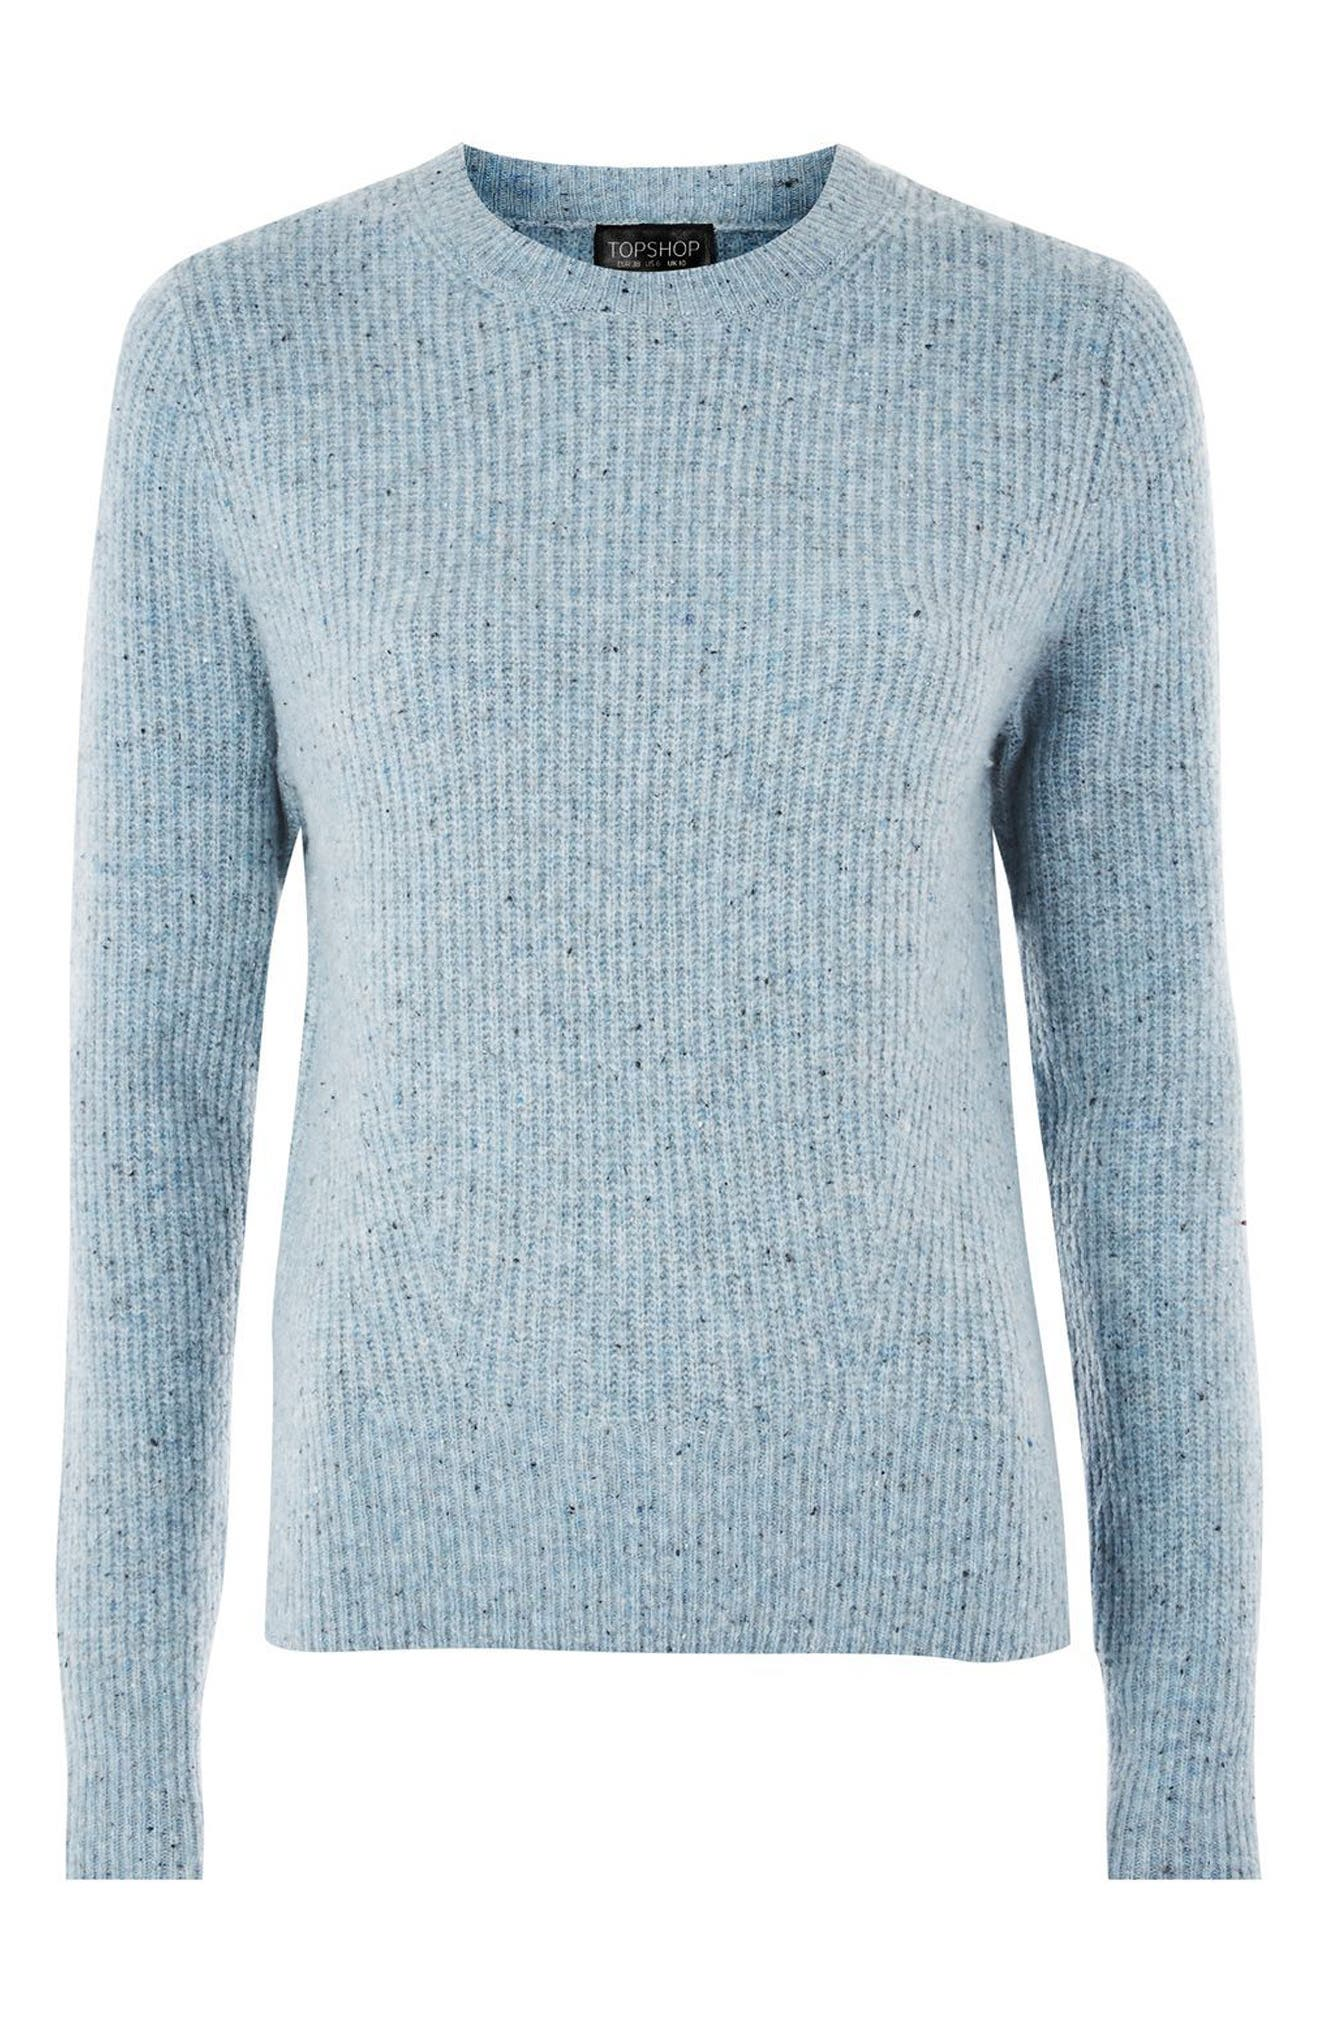 Alternate Image 3  - Topshop Ribbed Crewneck Sweater